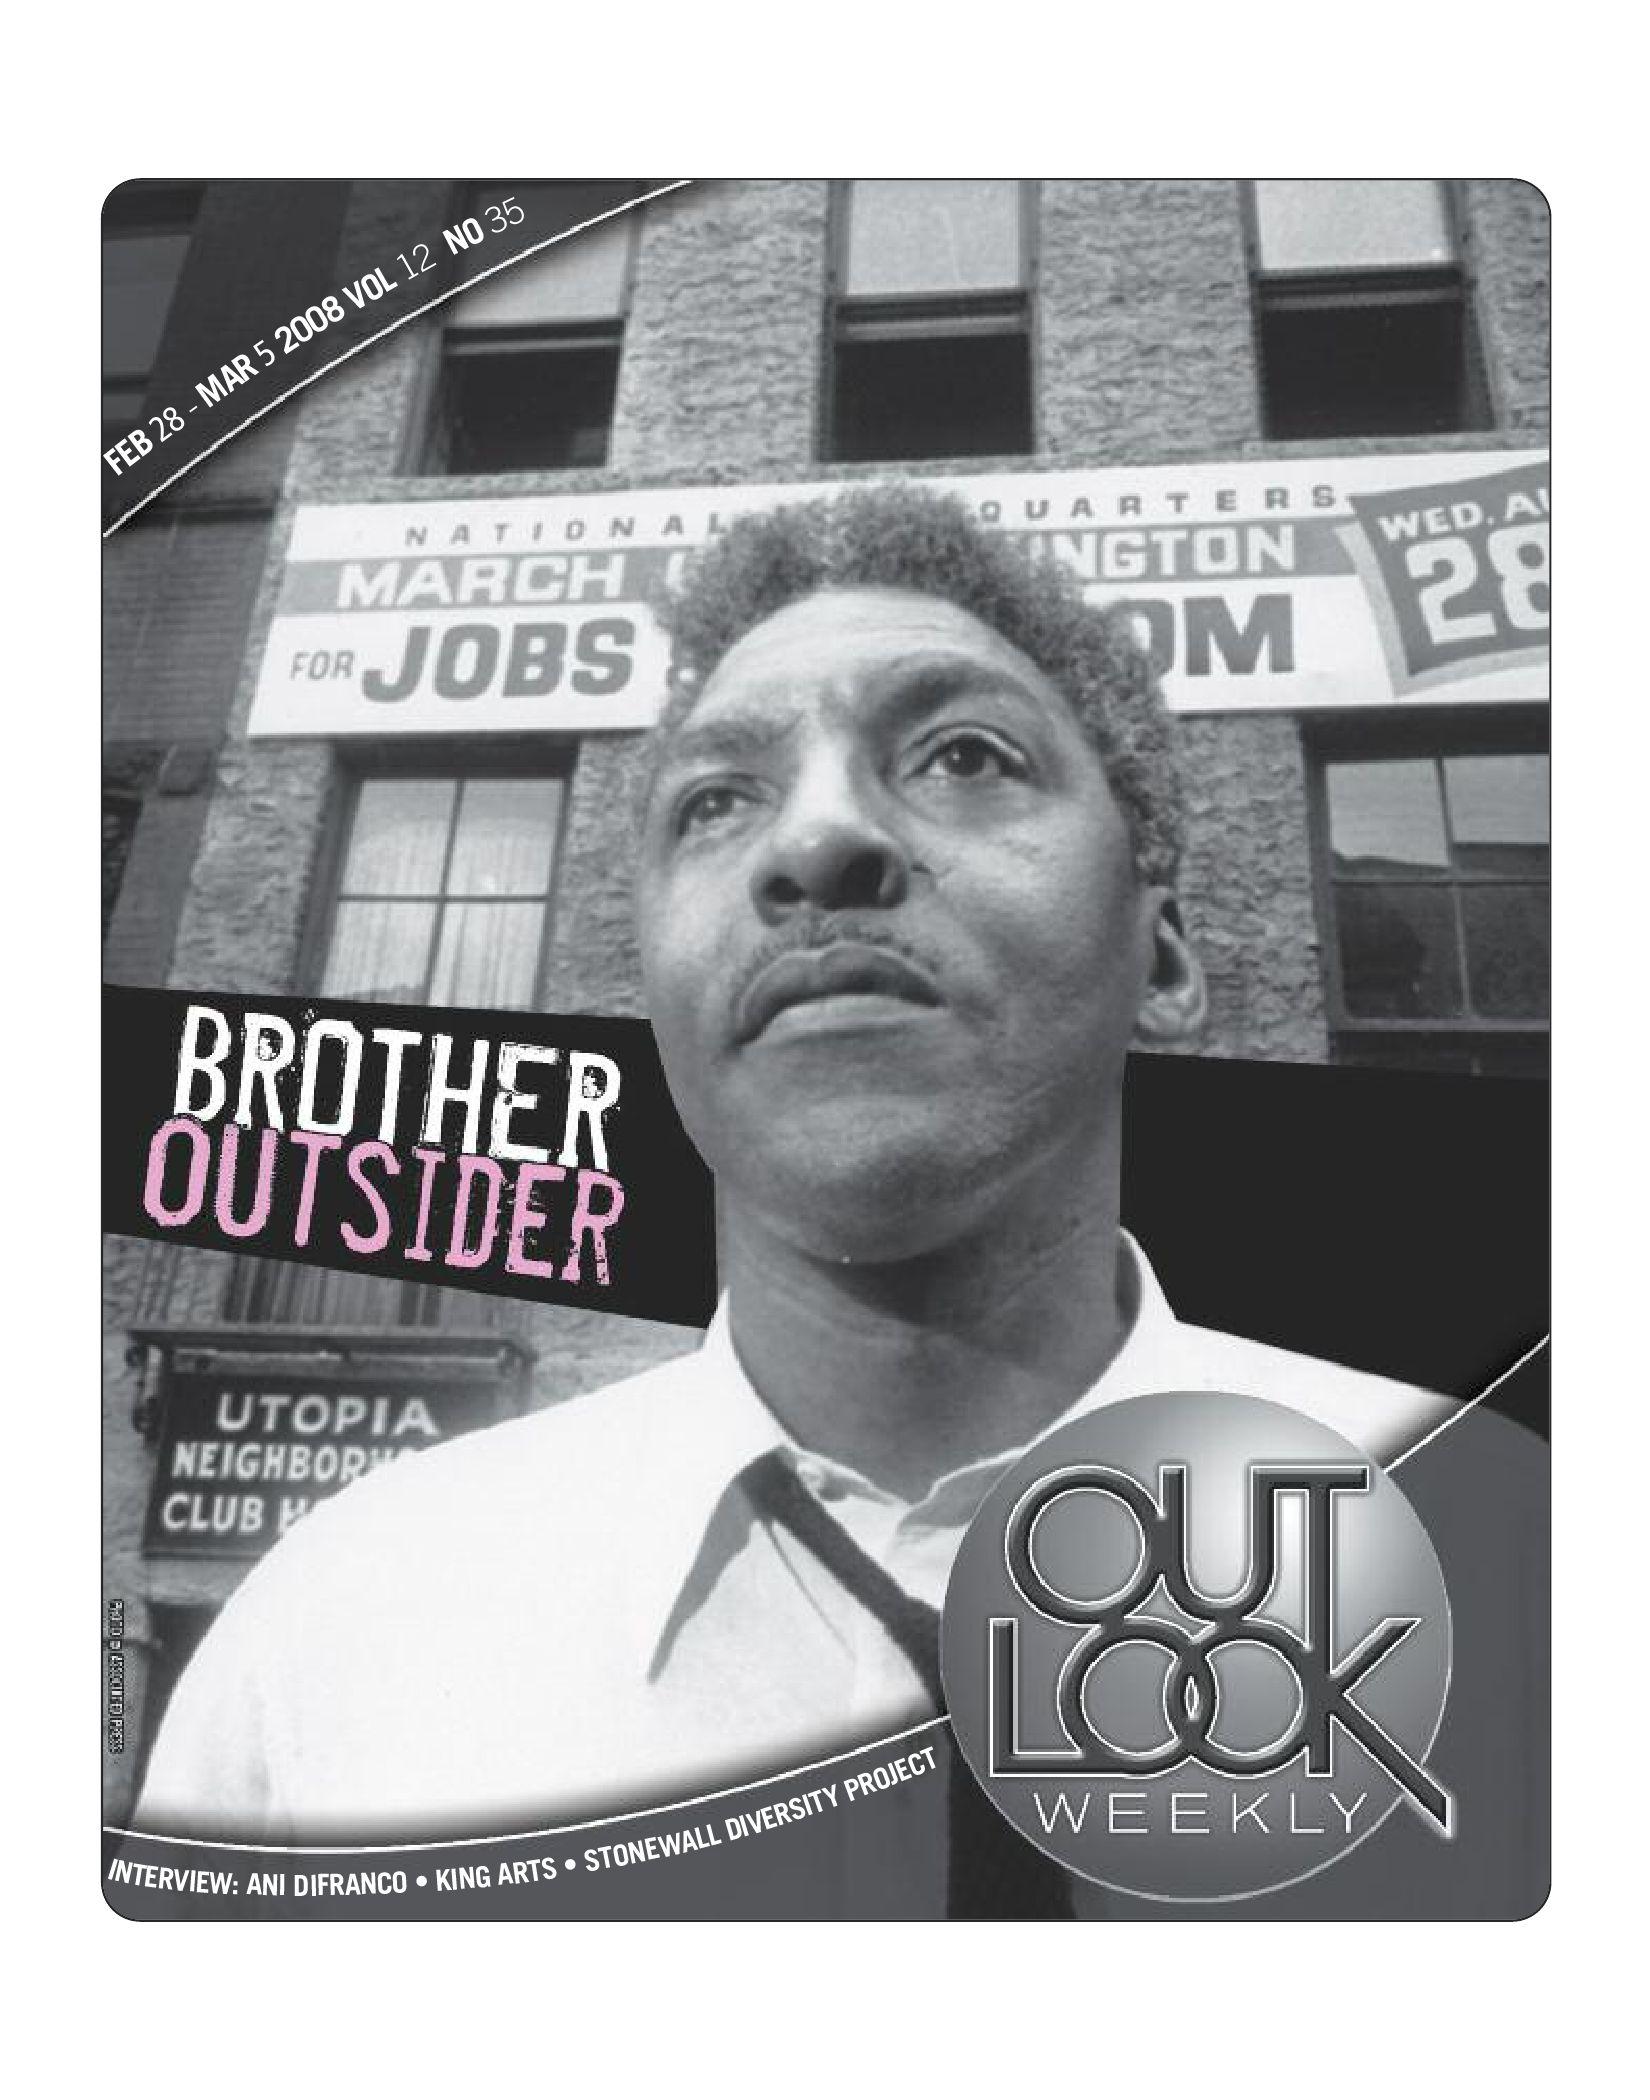 02.28.08 Outlook Weekly - Bother Outsider: Bayard Rustin